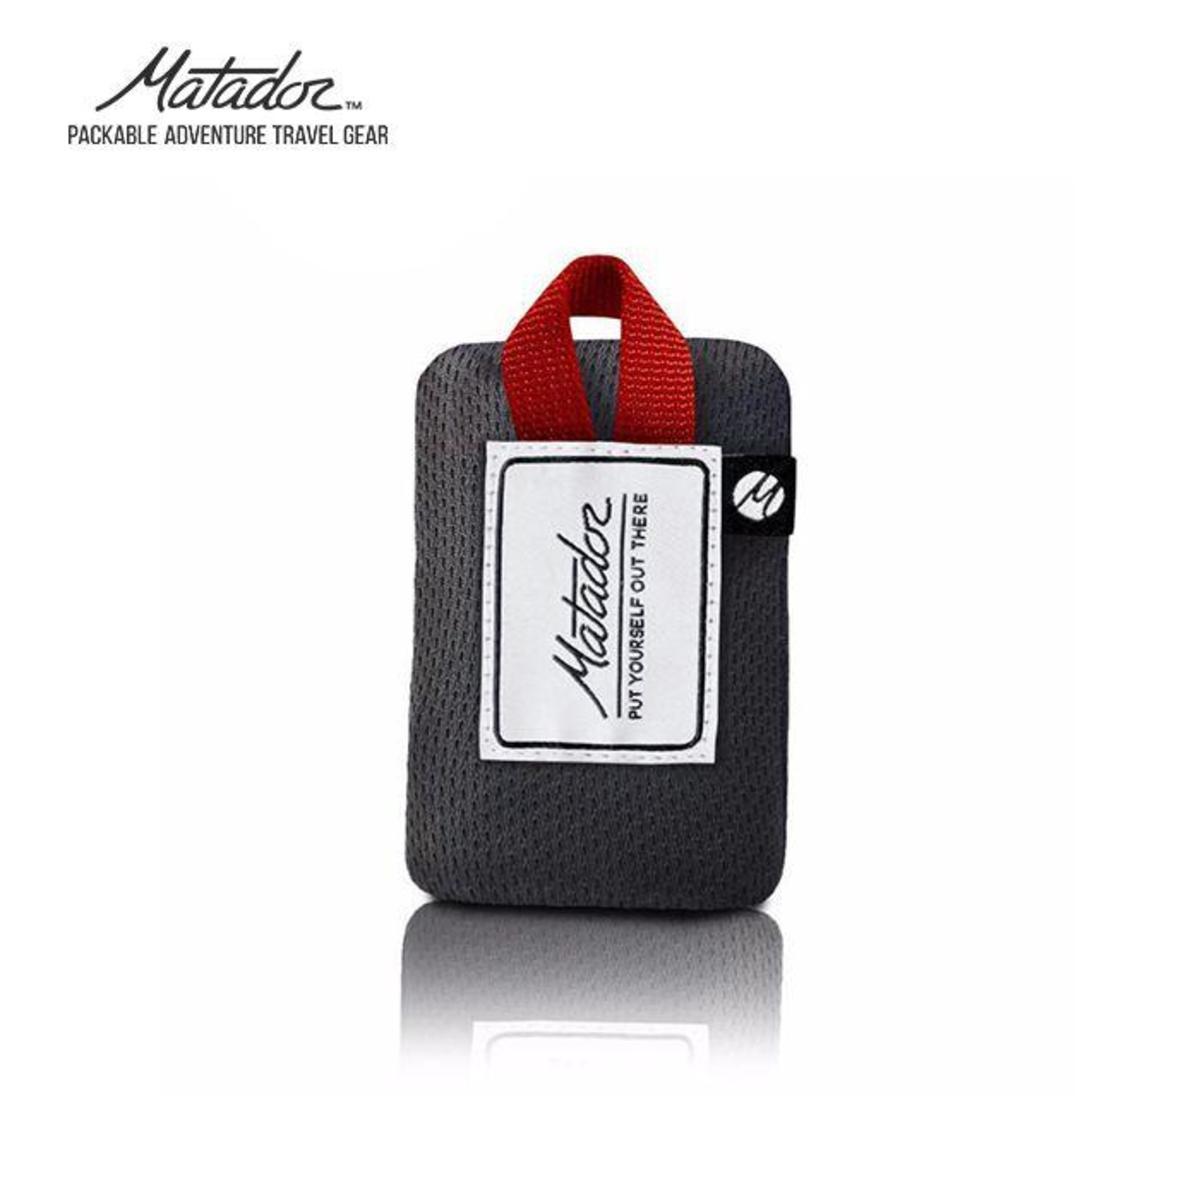 Mini Pocket Blanket 迷你口袋野餐戶外多功能墊 紅色